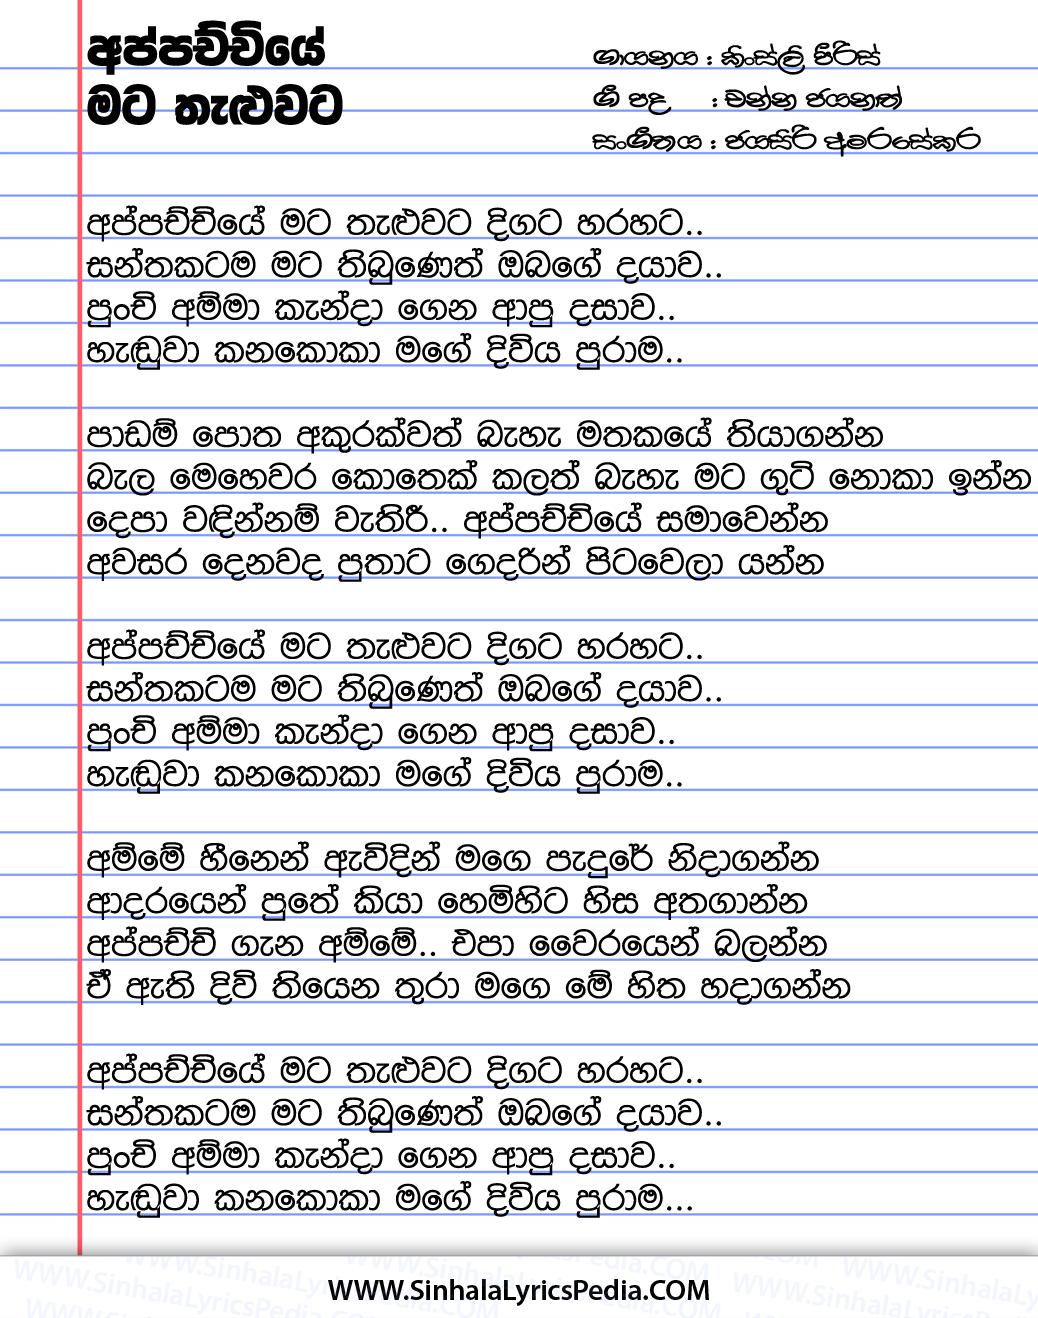 Appachchiye Mata Thaluwata Song Lyrics